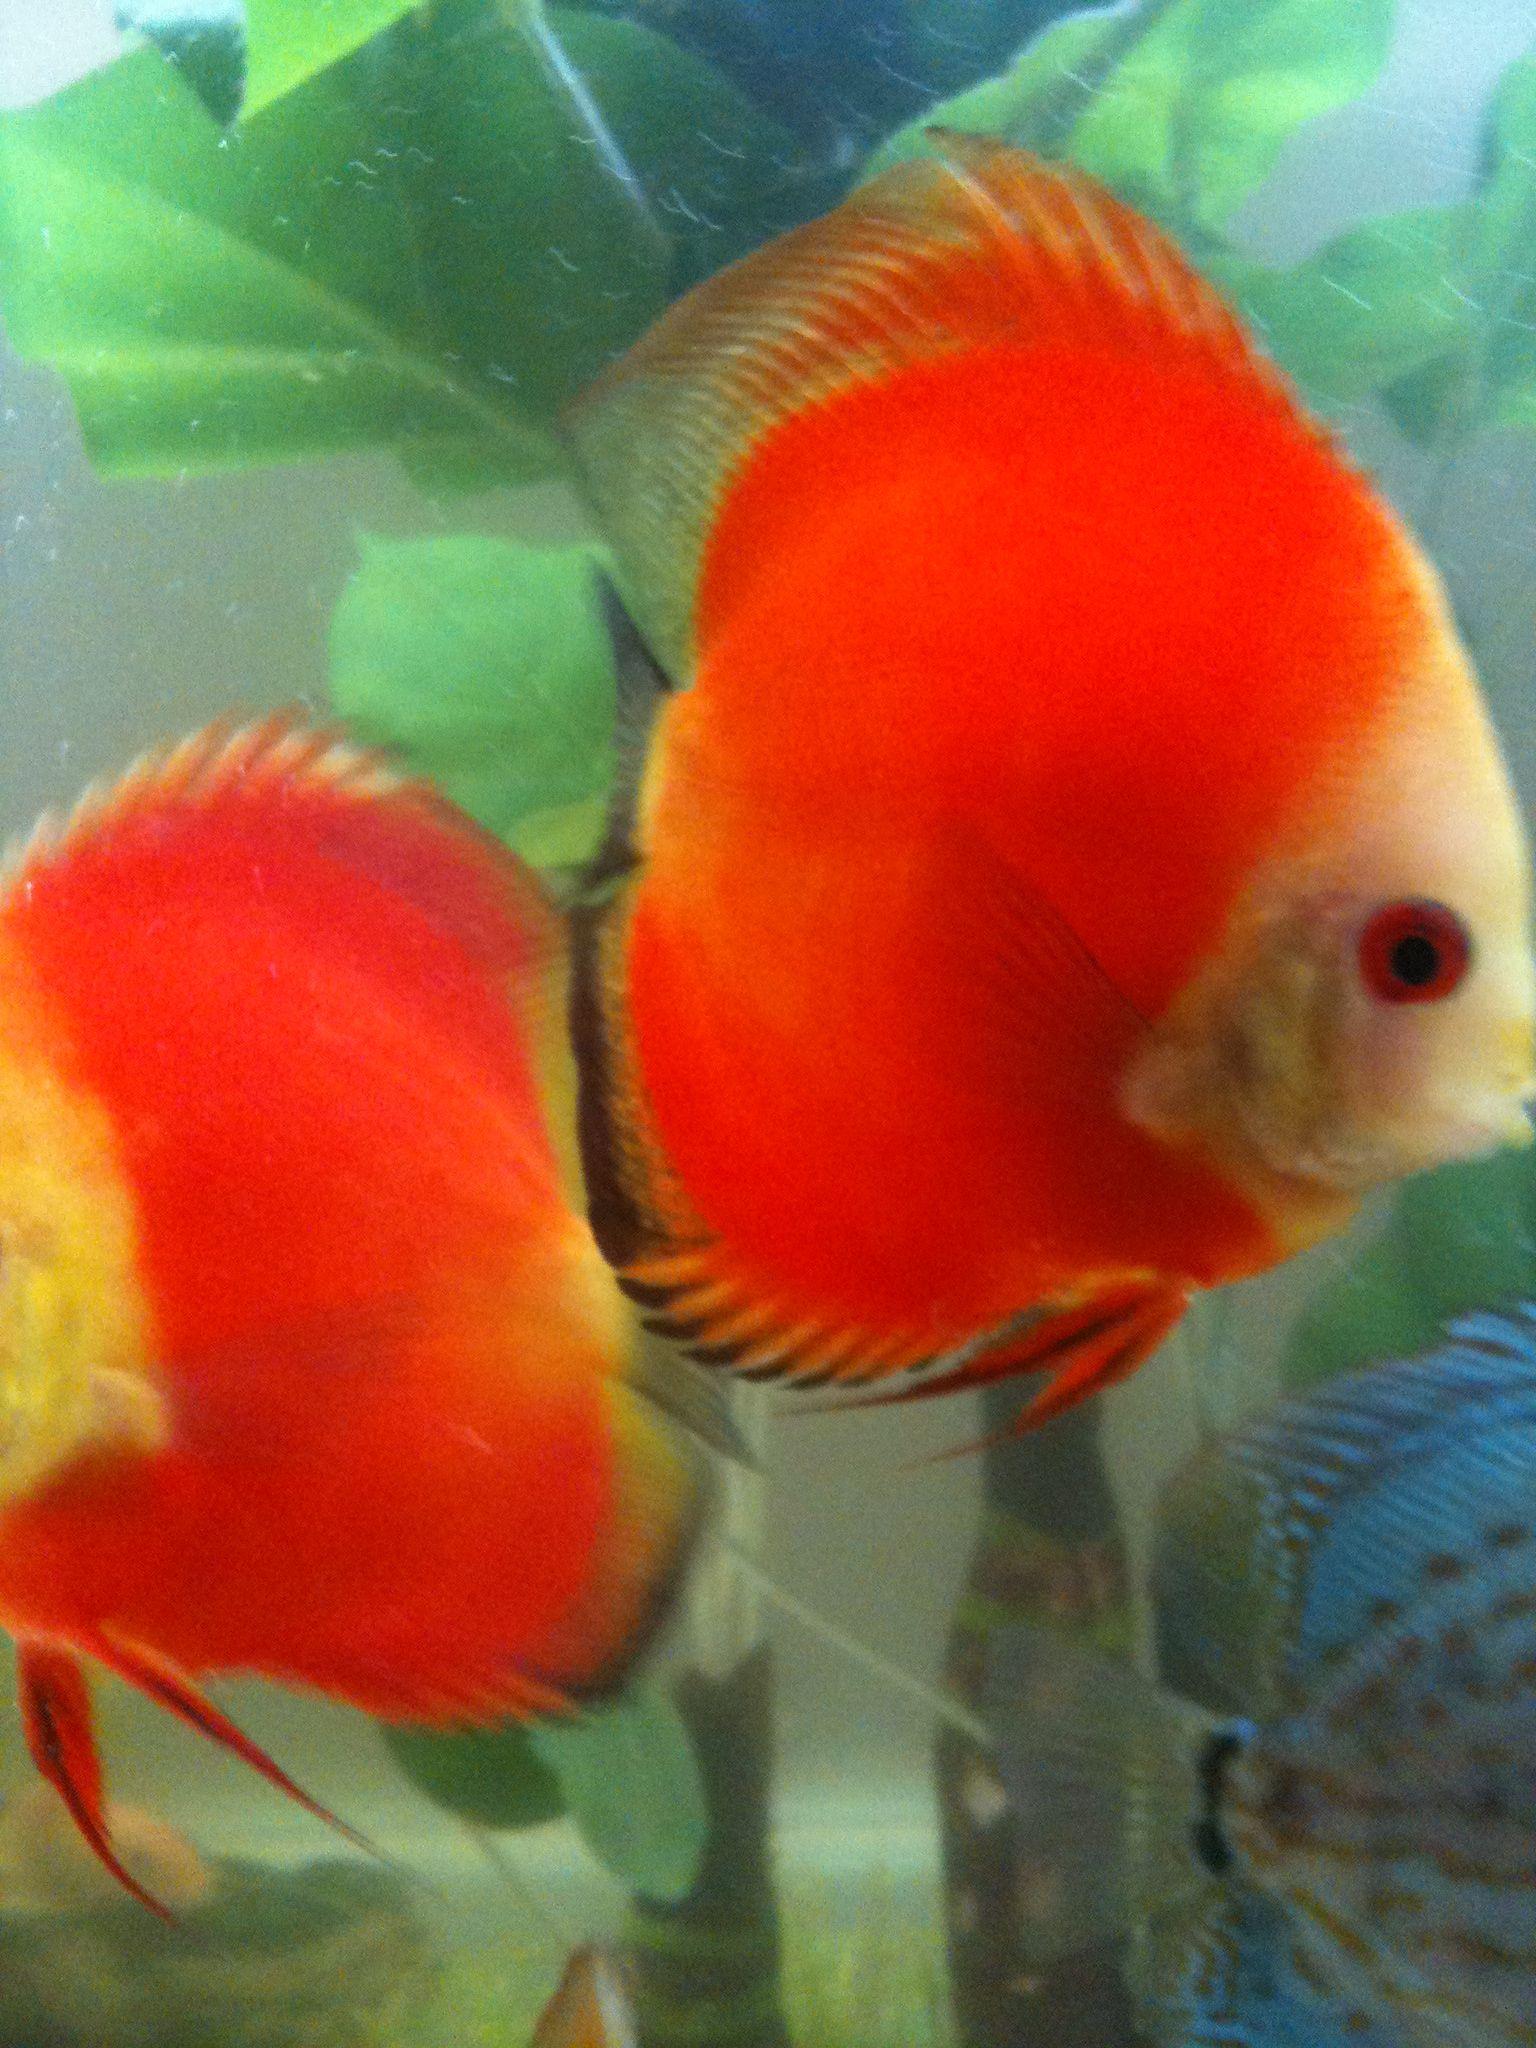 2012-11-05 Orange Melons | Tropical fish and aquariums | Pinterest ...